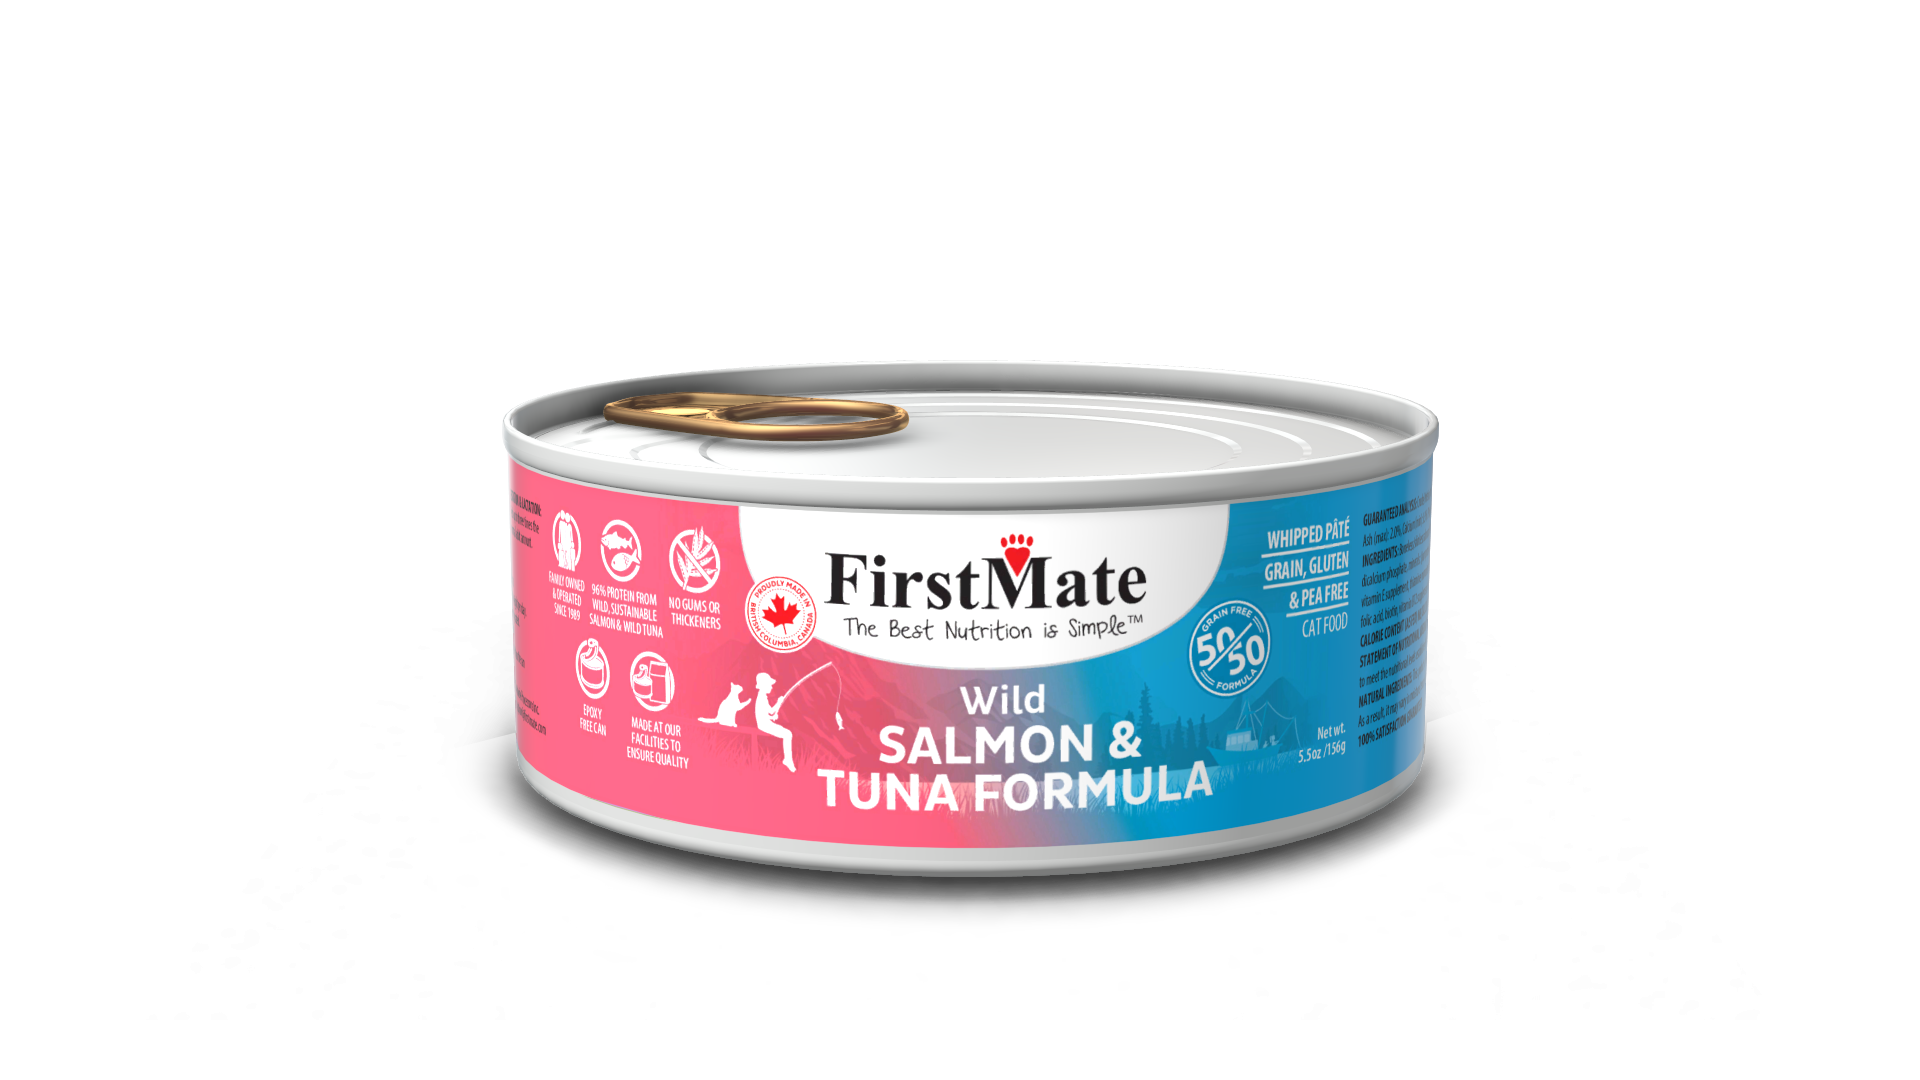 FirstMate FirstMate Limited Ingredient Diet 50/50 Salmon & Tuna Wet Cat Food 5.5oz